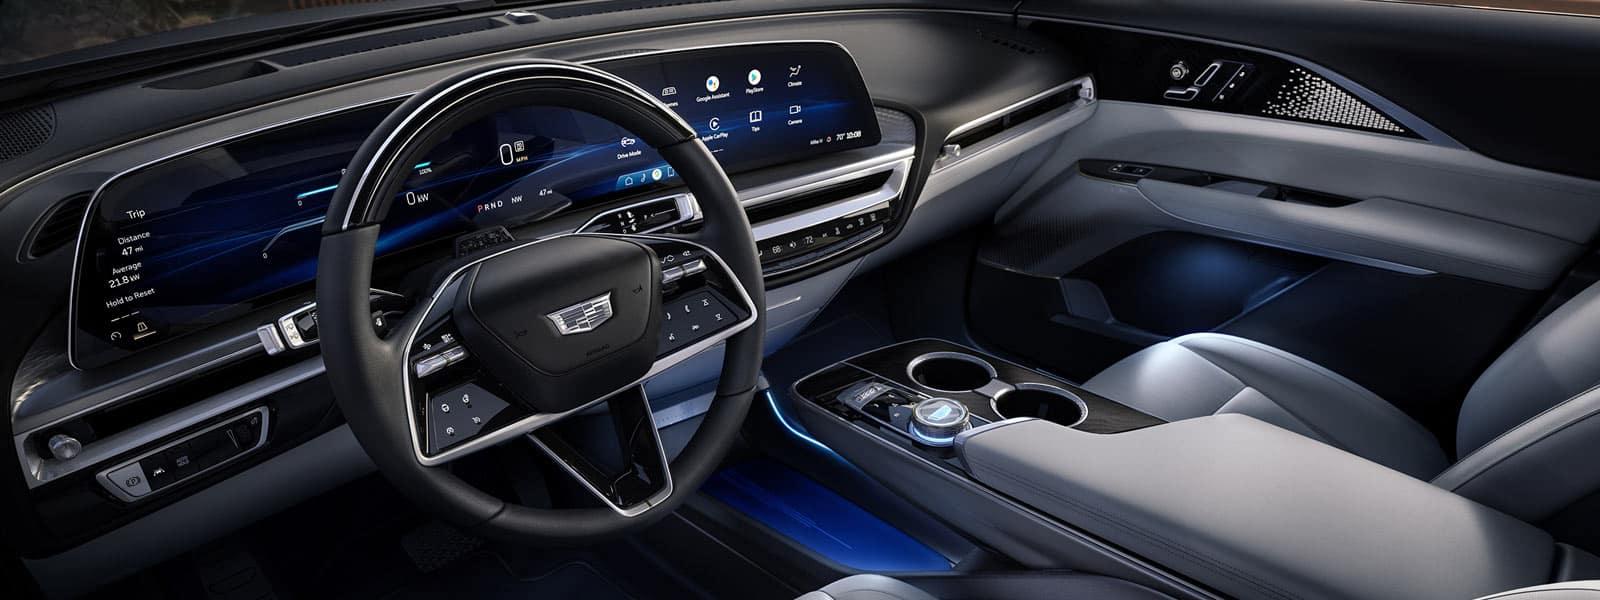 Pre-order 2023 Cadillac LYRIQ EV Coming in Thornhill Ontario